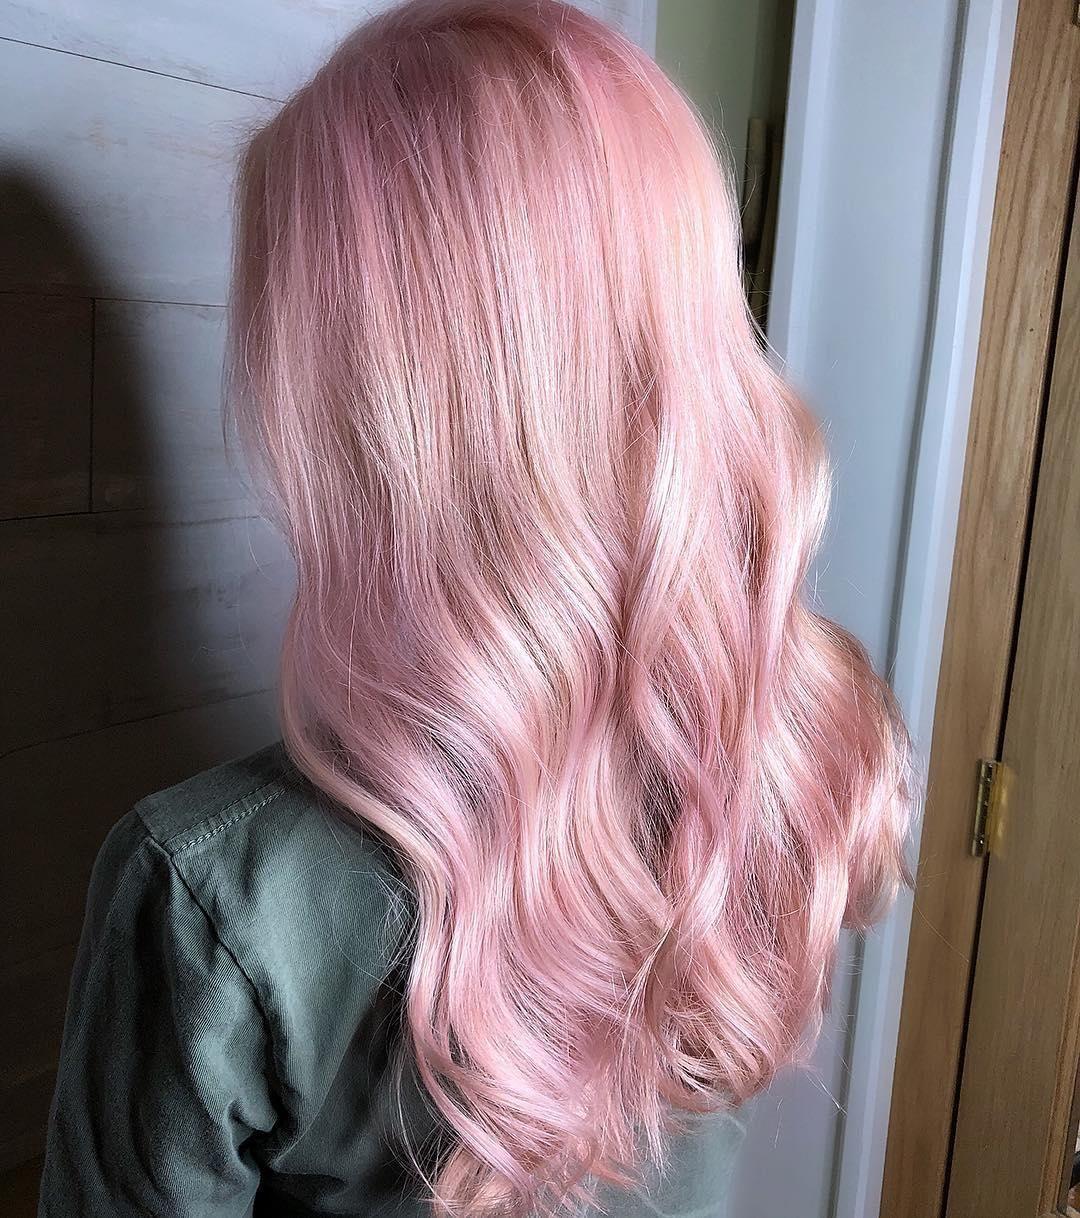 Hair Color Landing Page Pink Hair Dye Light Pink Hair Hair Color Pink